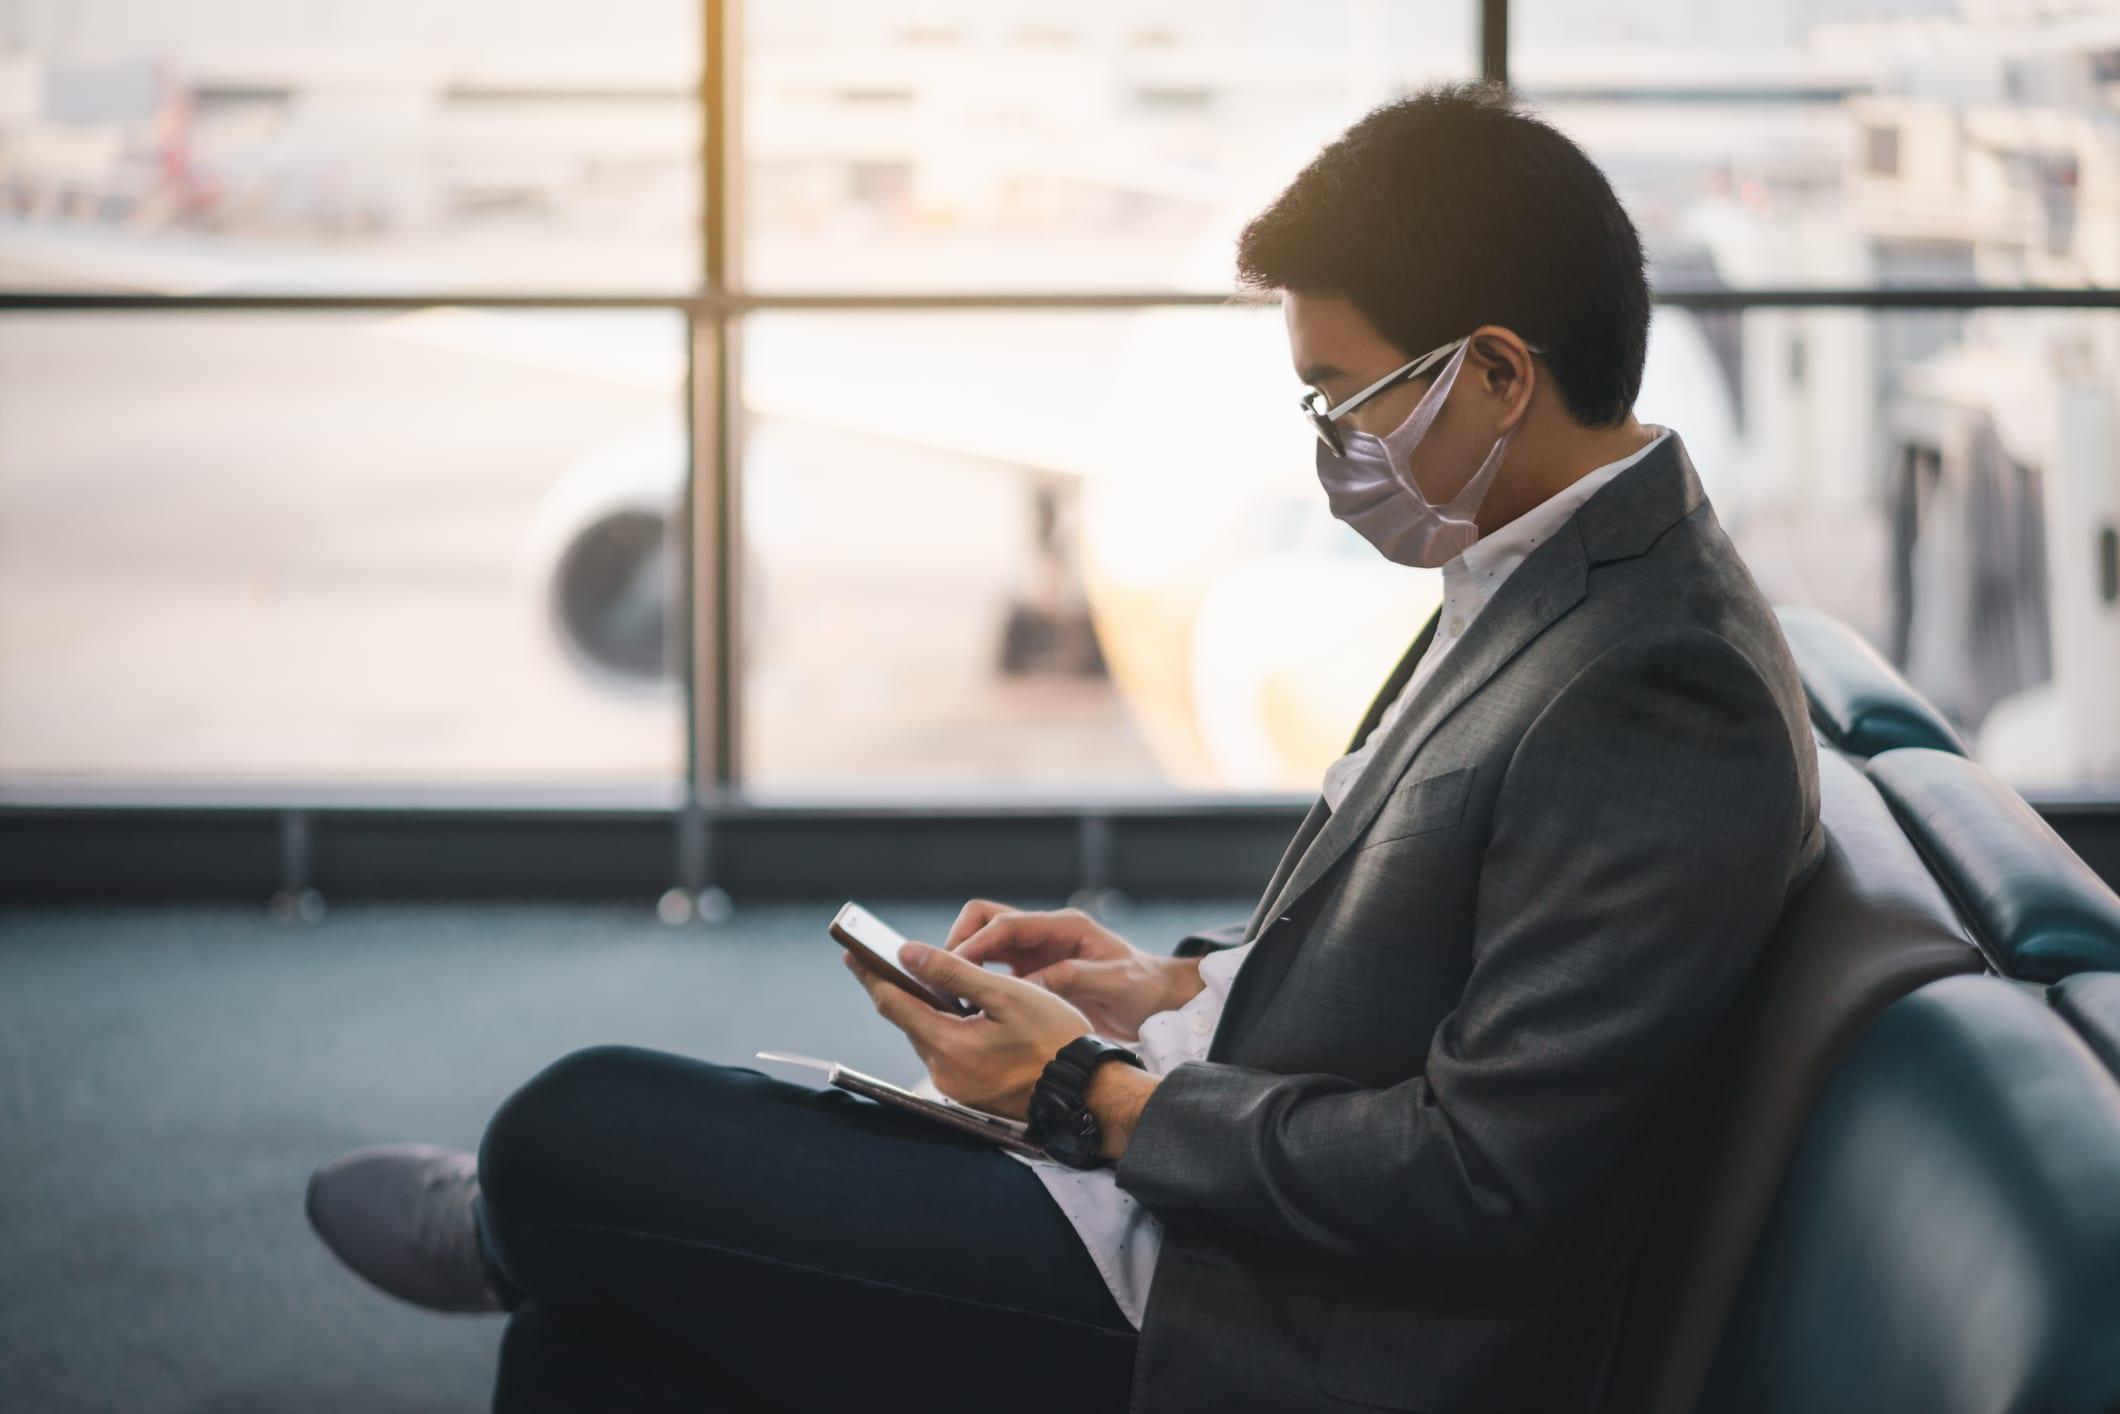 Travel giant Amadeus adds fintech functionality from travel app developer Hopper